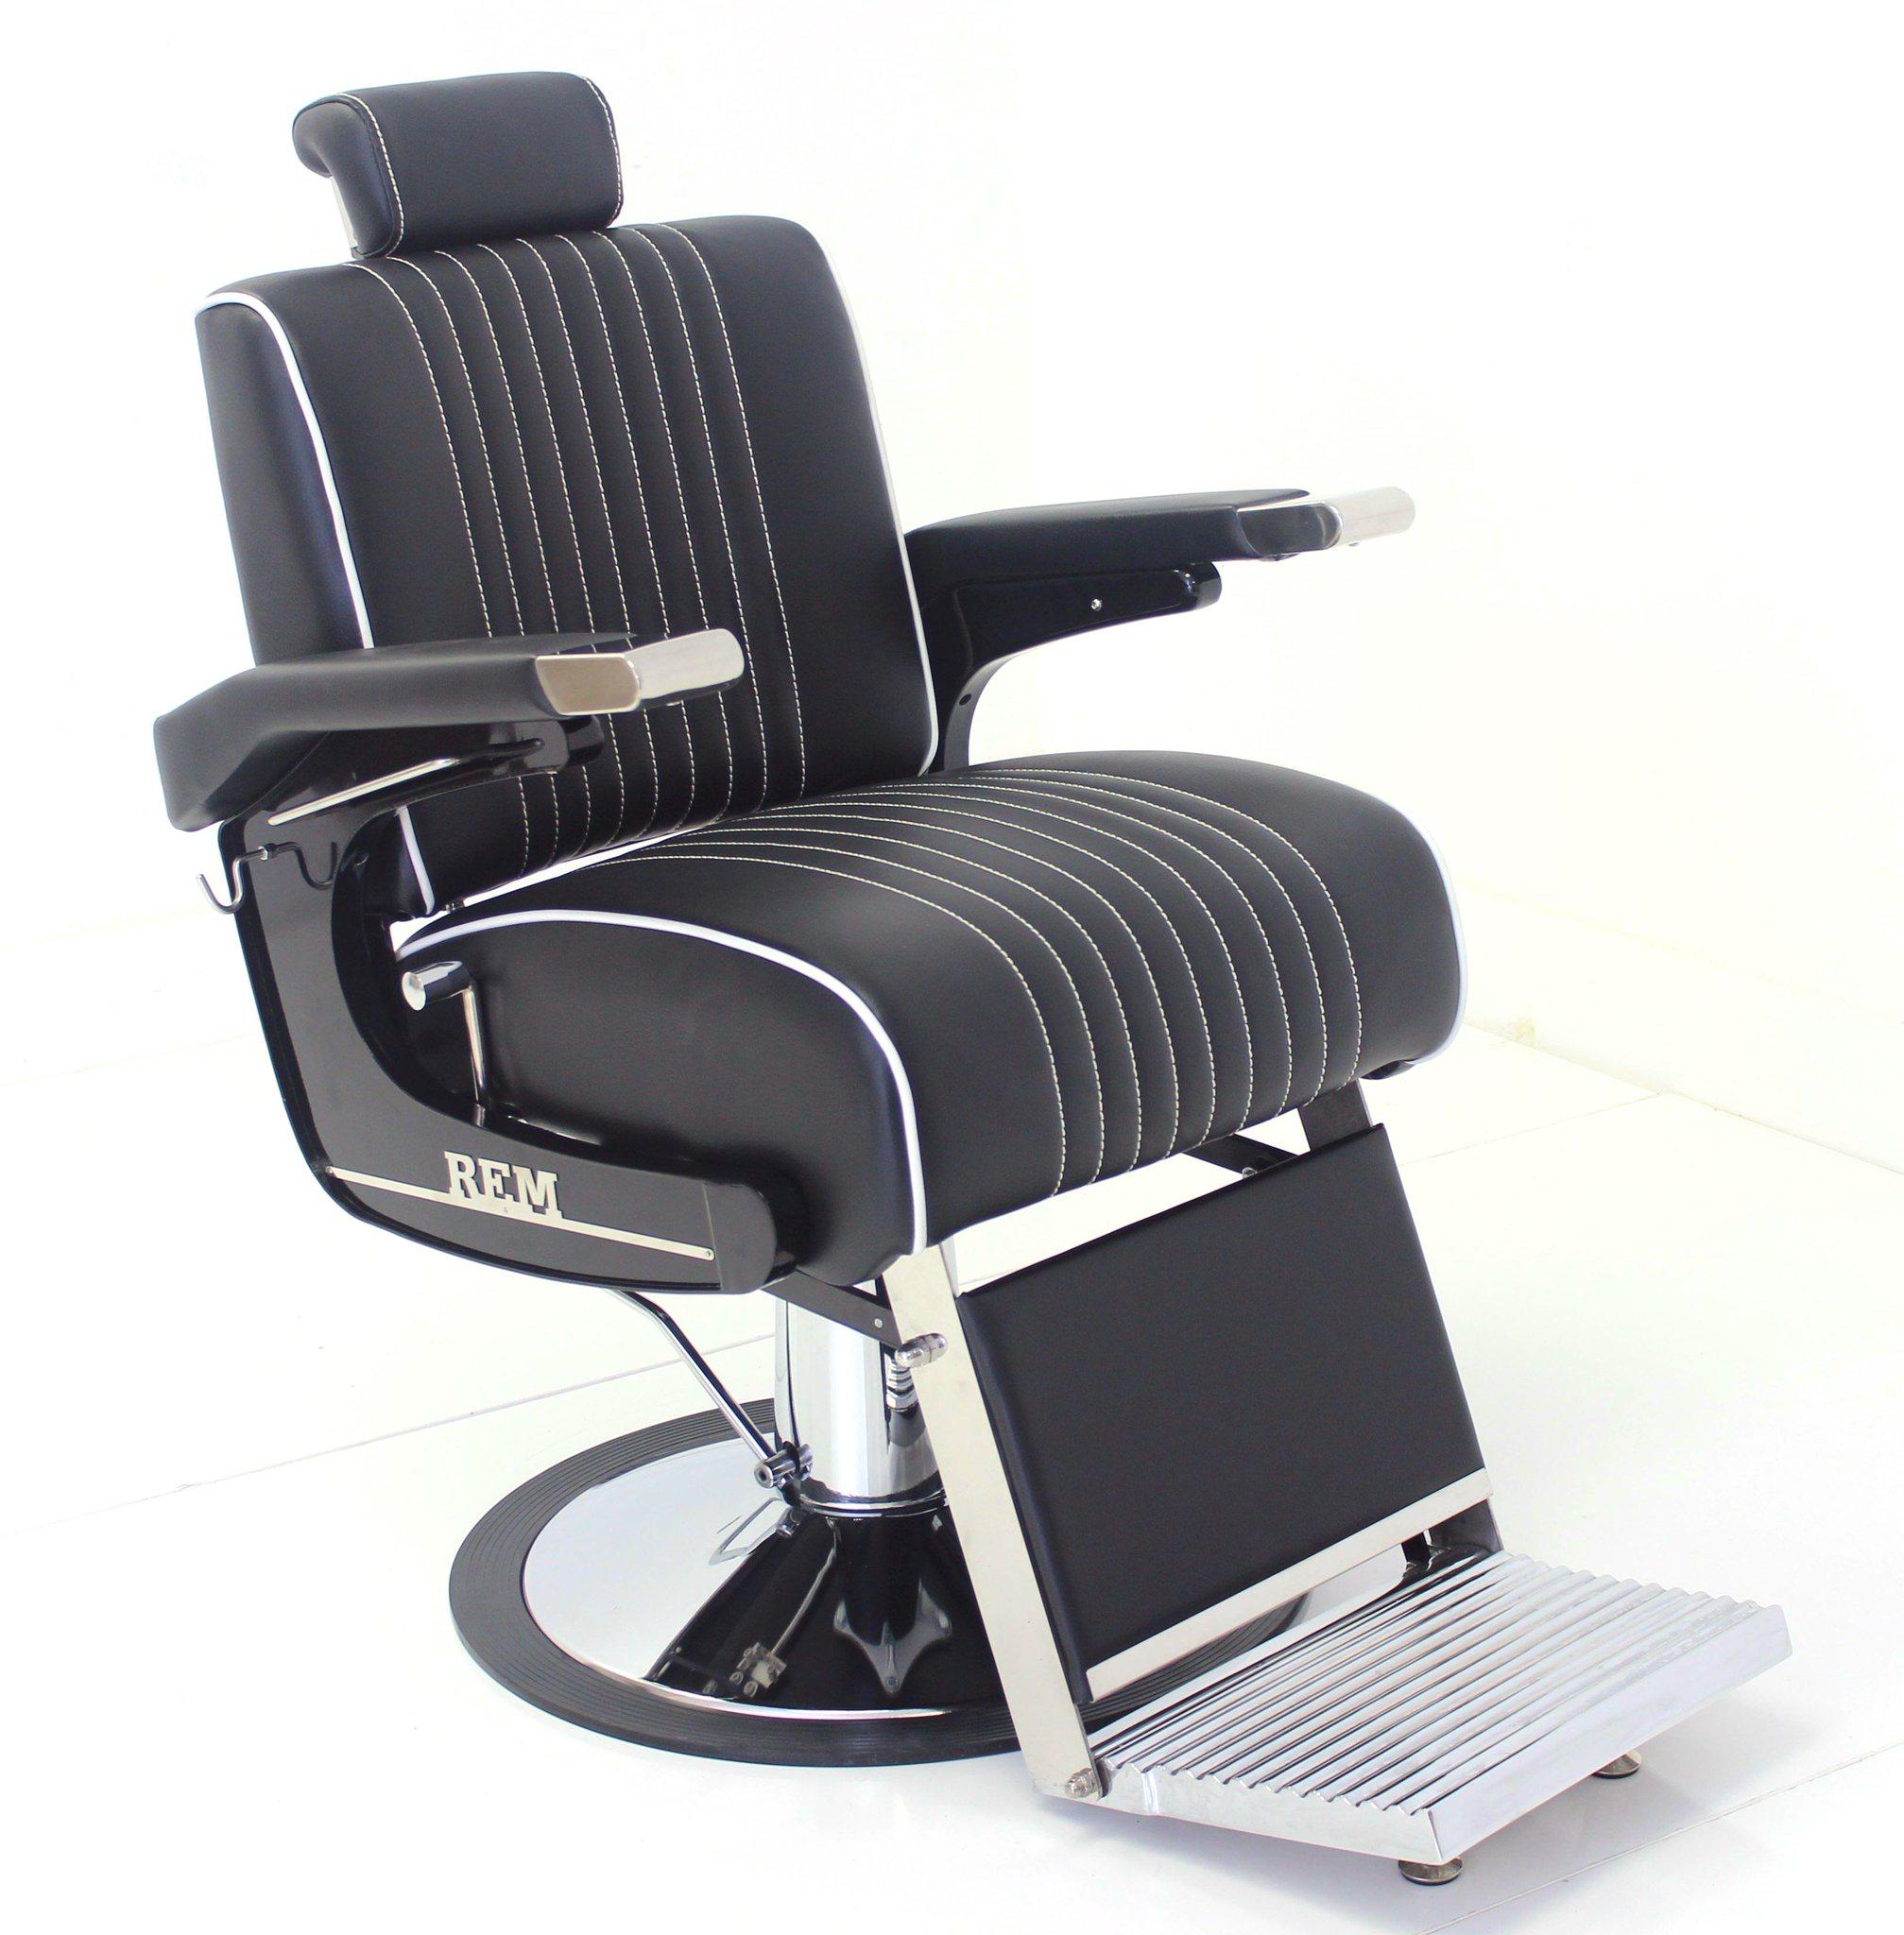 Pin De Roudy En Barbers Chairs Salones Muebles Spa